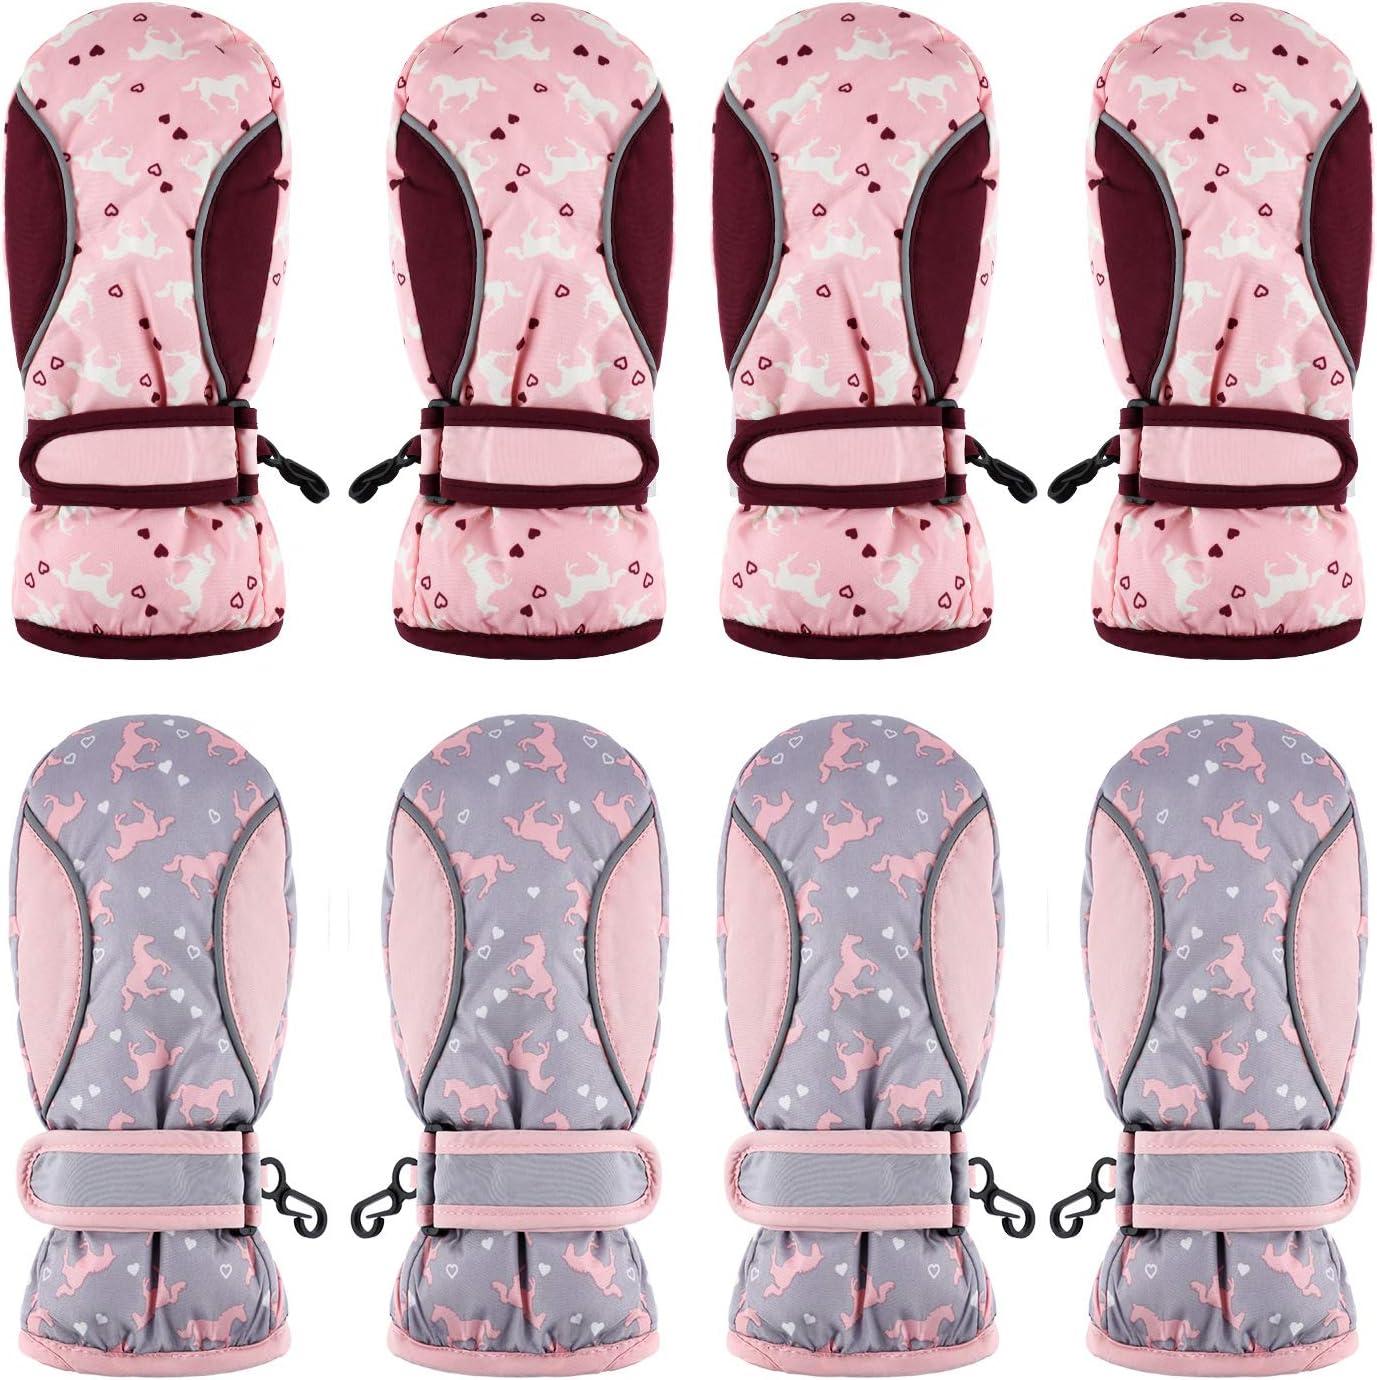 4 Pairs Kids Ski Mitten Gloves Waterproof Warm Snow Gloves for Winter Outdoor Activities